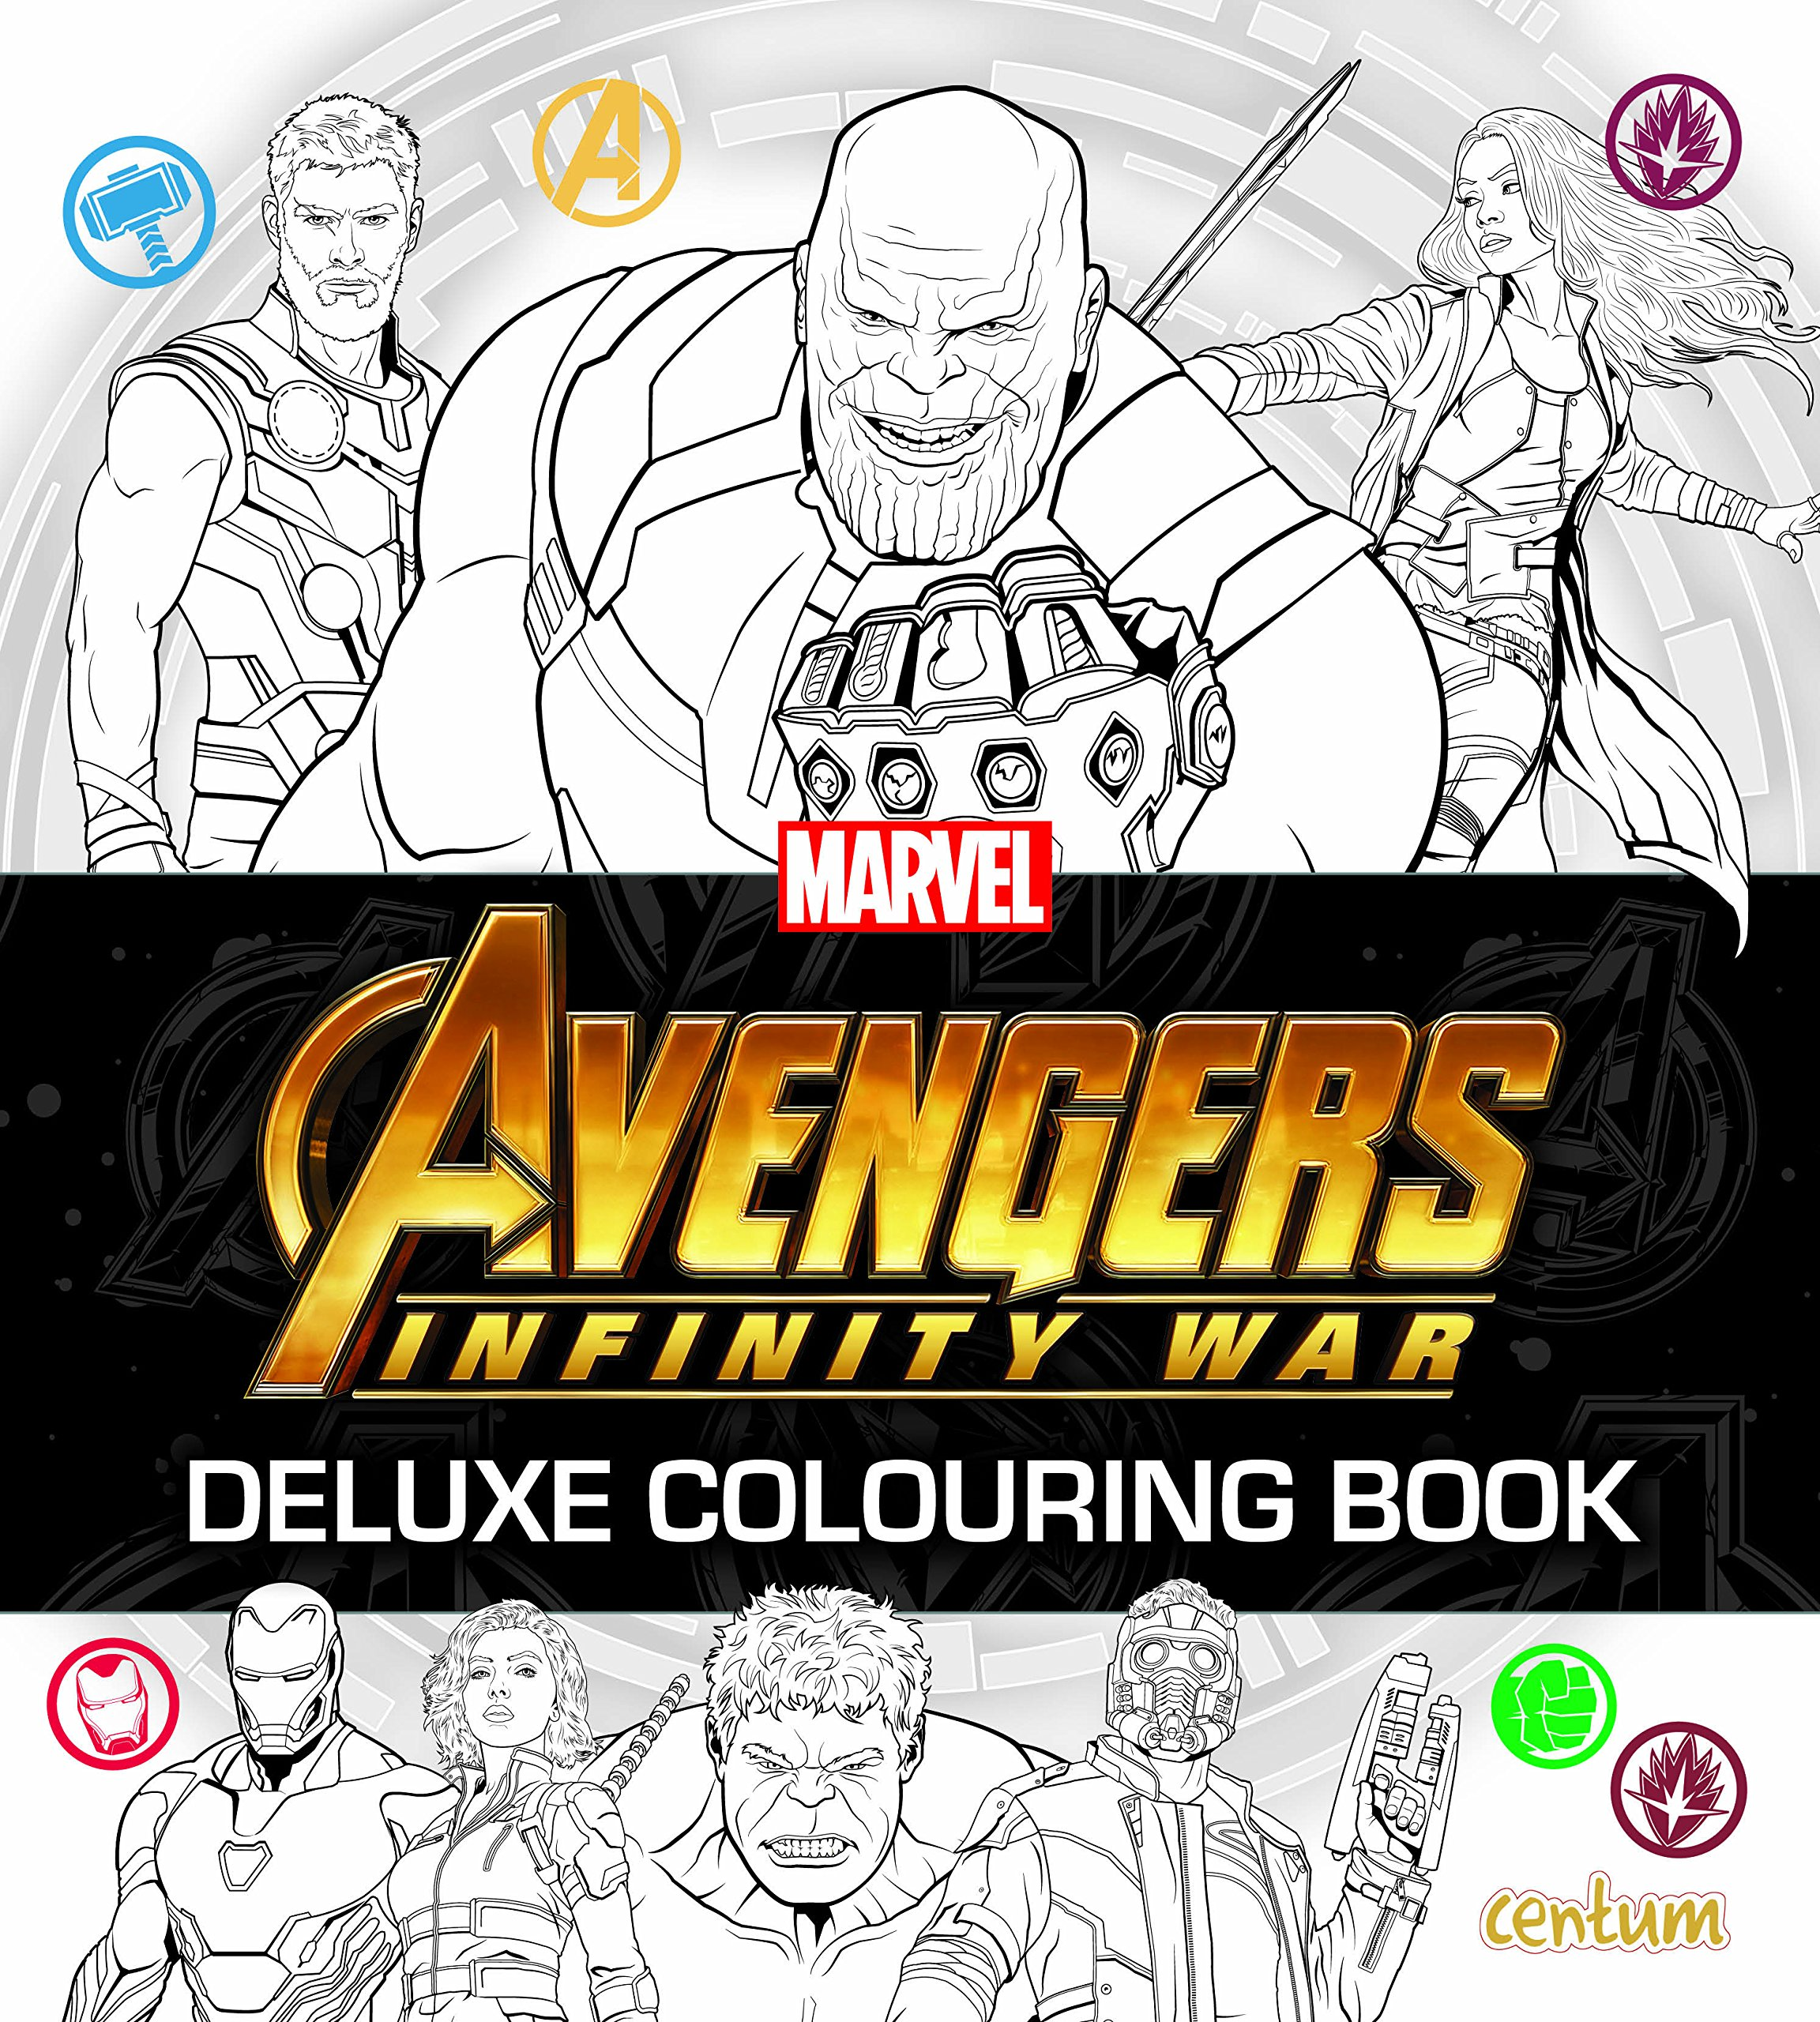 Amazon Com Avengers Infinity War Deluxe Colouring B 9781911461838 Books